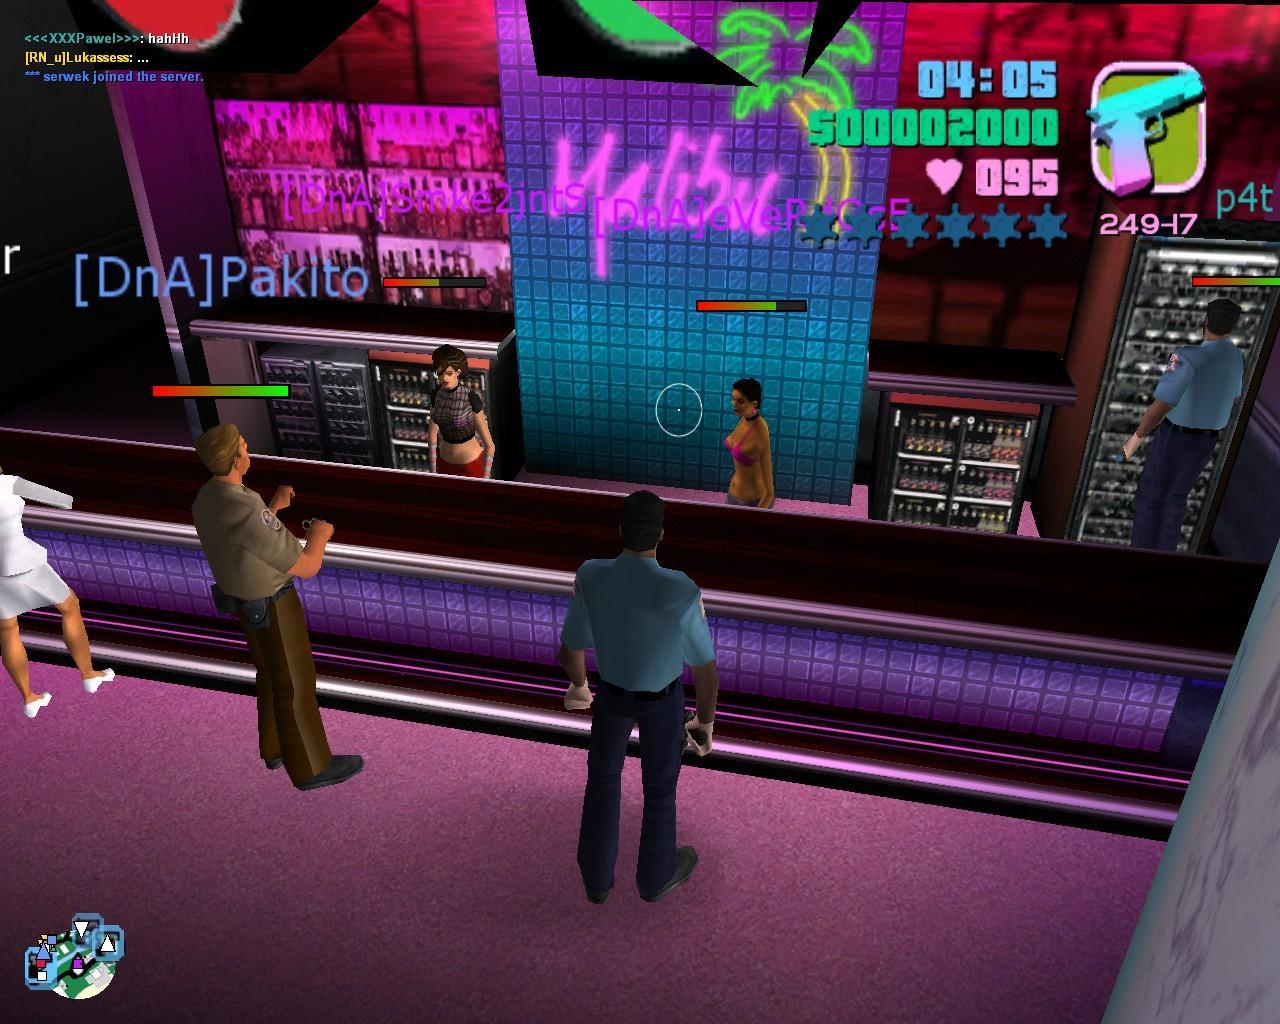 GTA III   GTA Vice City   Multiplayer Mod  Full Espa  Ol   2 CD S ISO